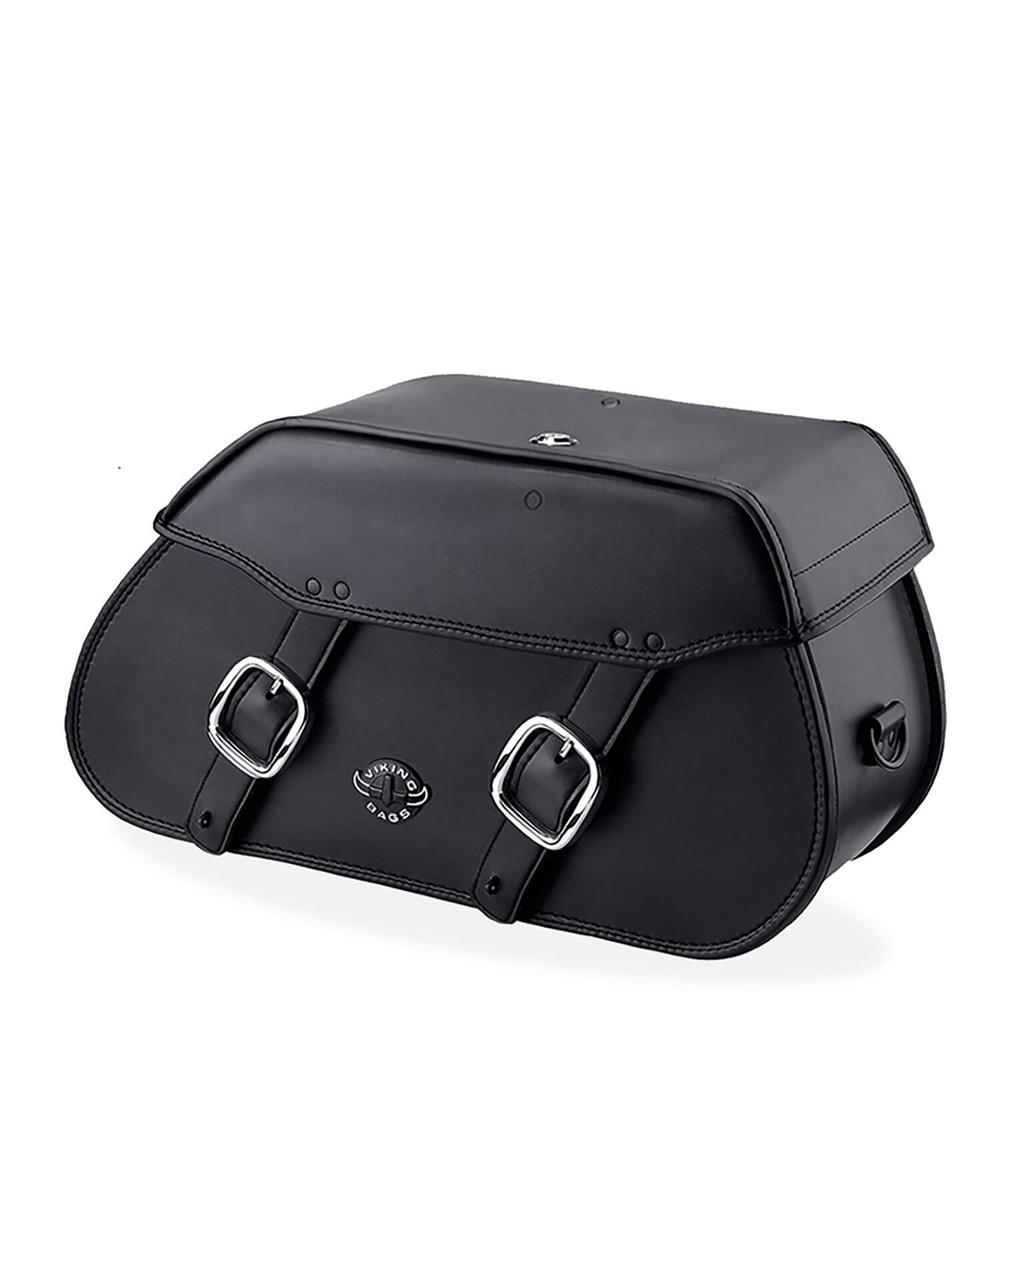 Viking Pinnacle Motorcycle Saddlebags For Harley Softail Night Train FXSTB Main Bag View